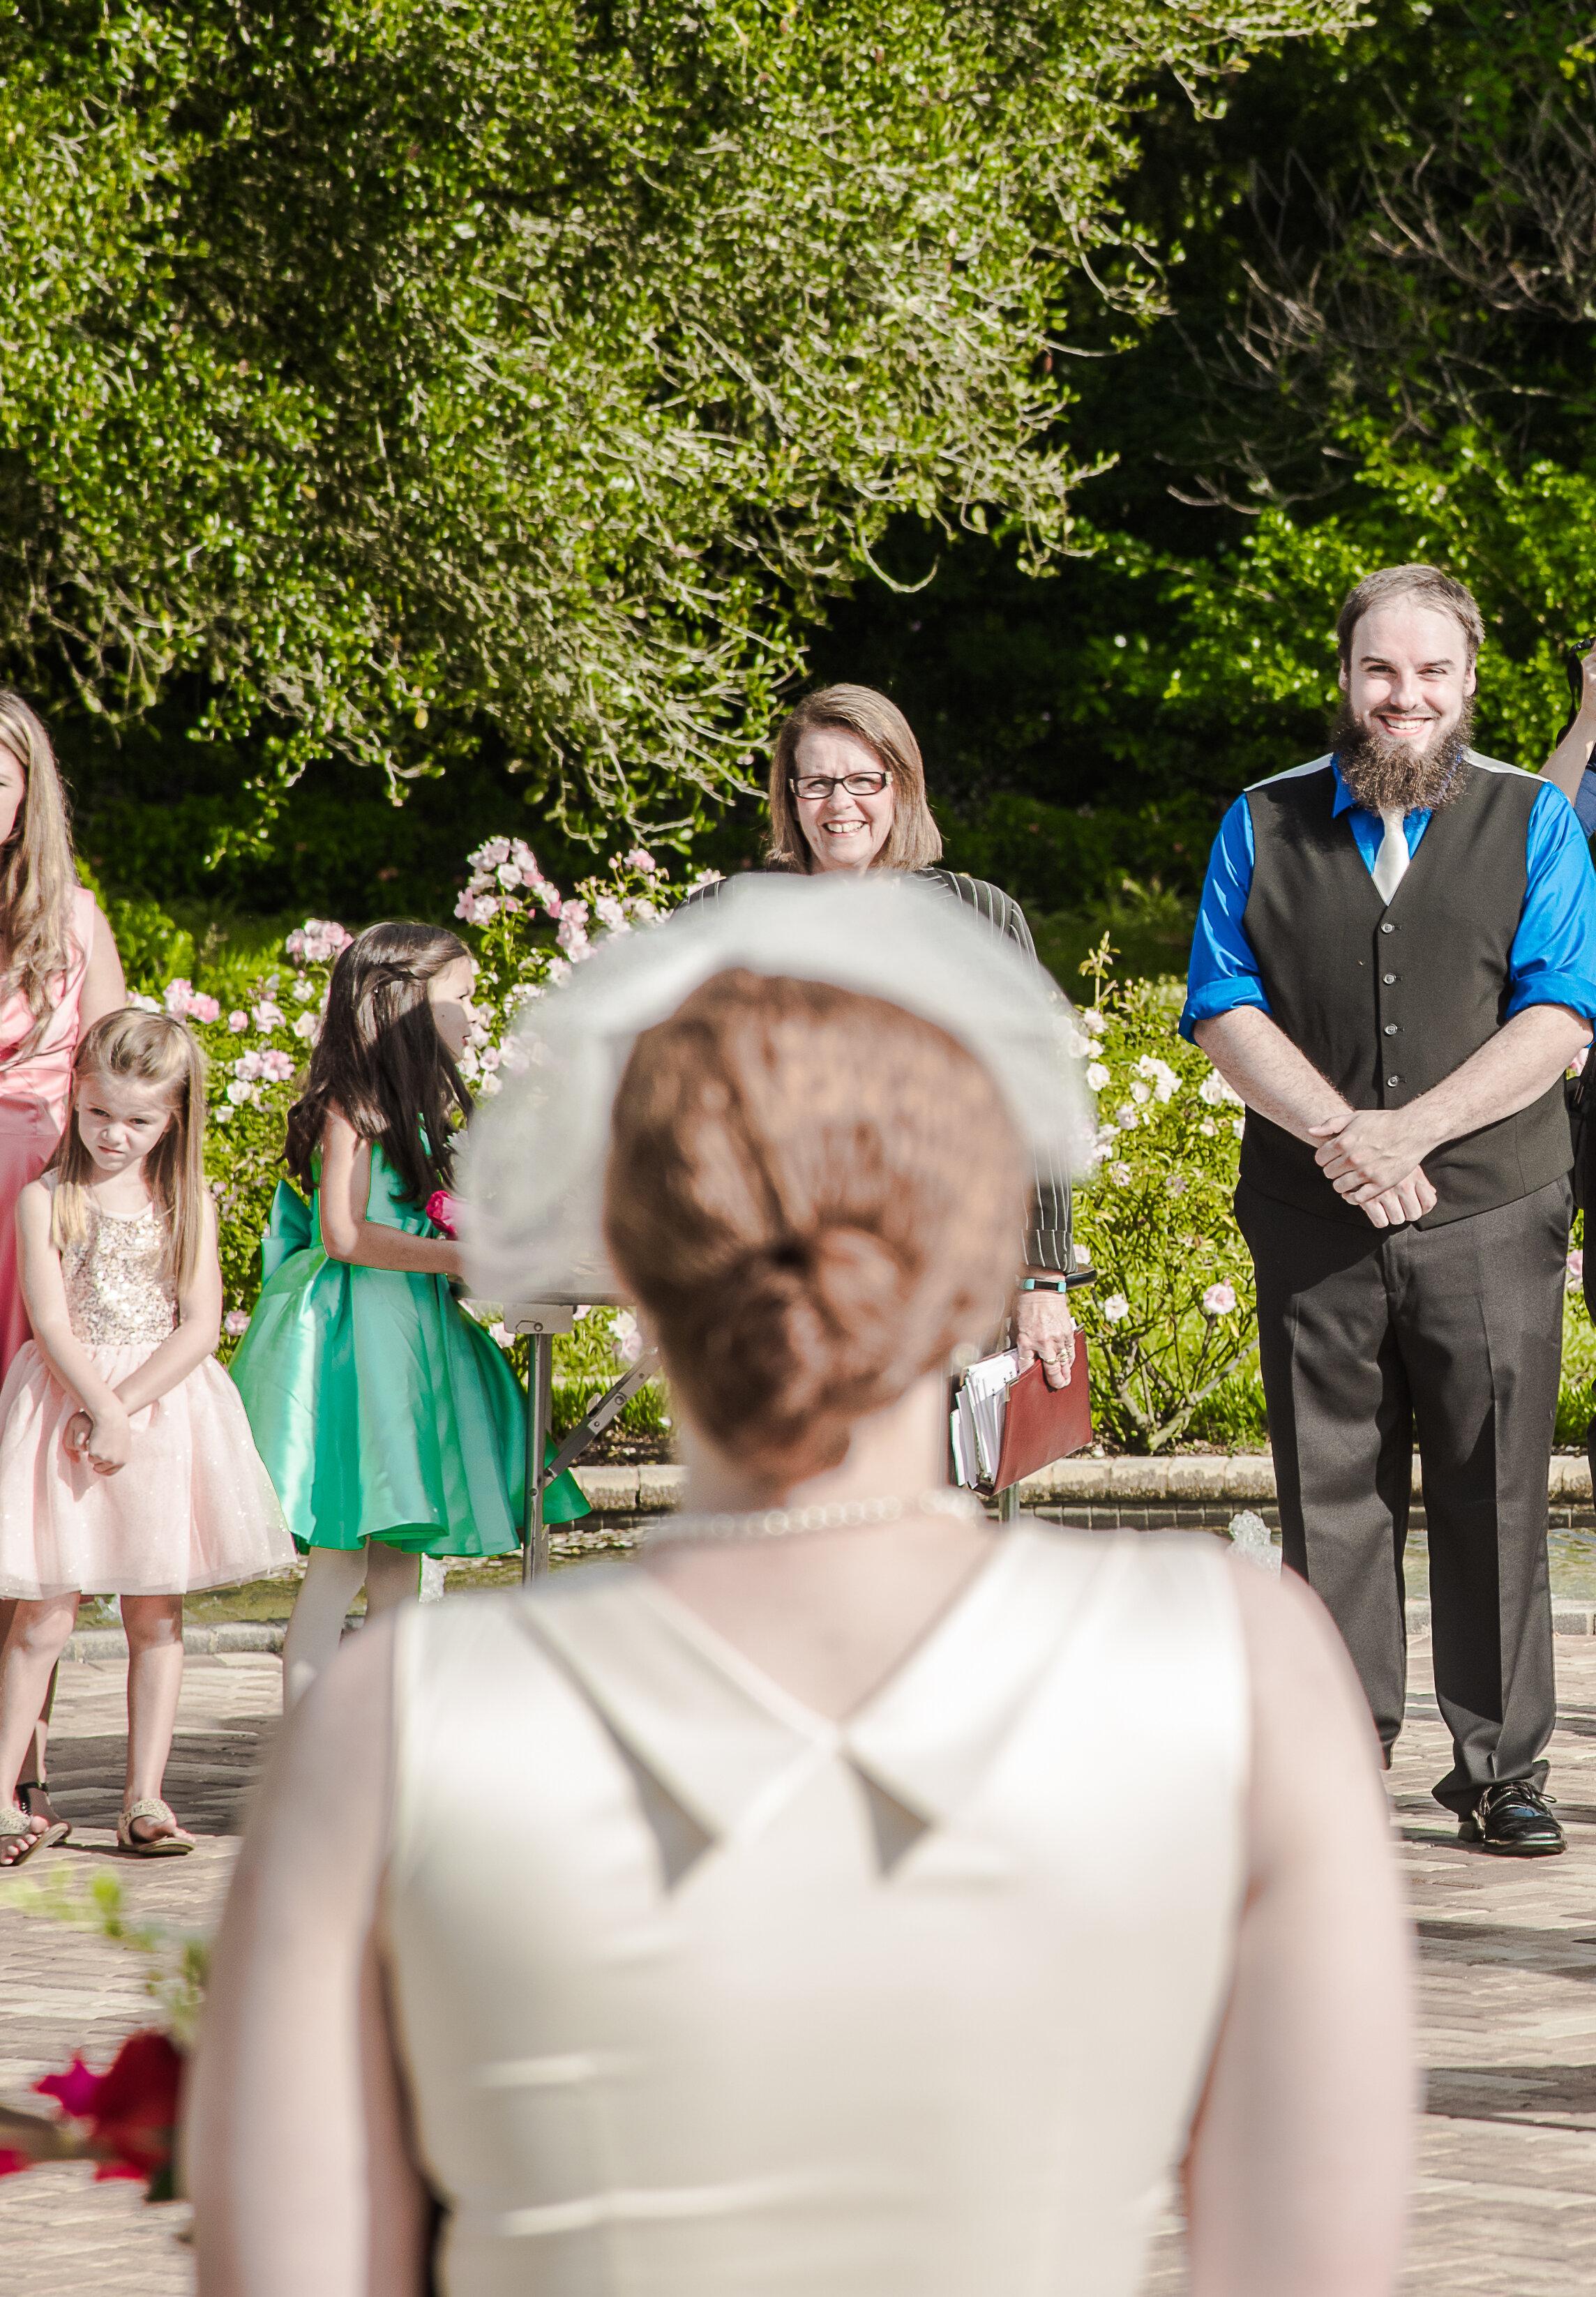 herry-garden-wedding-1-44.jpg